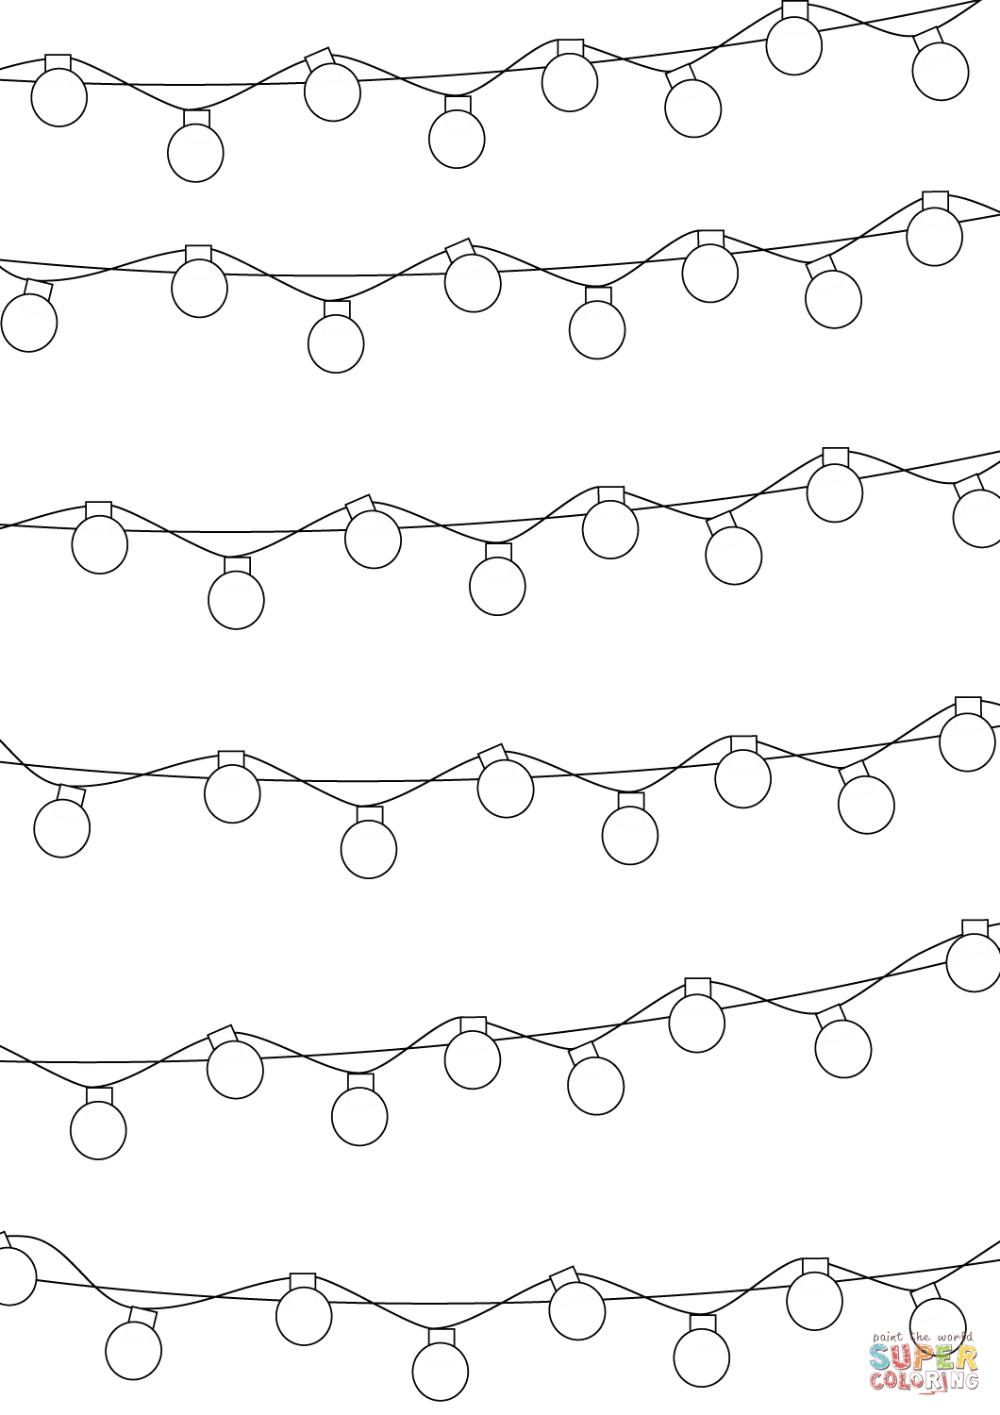 Christmas Lights Pattern coloring page Free Printable